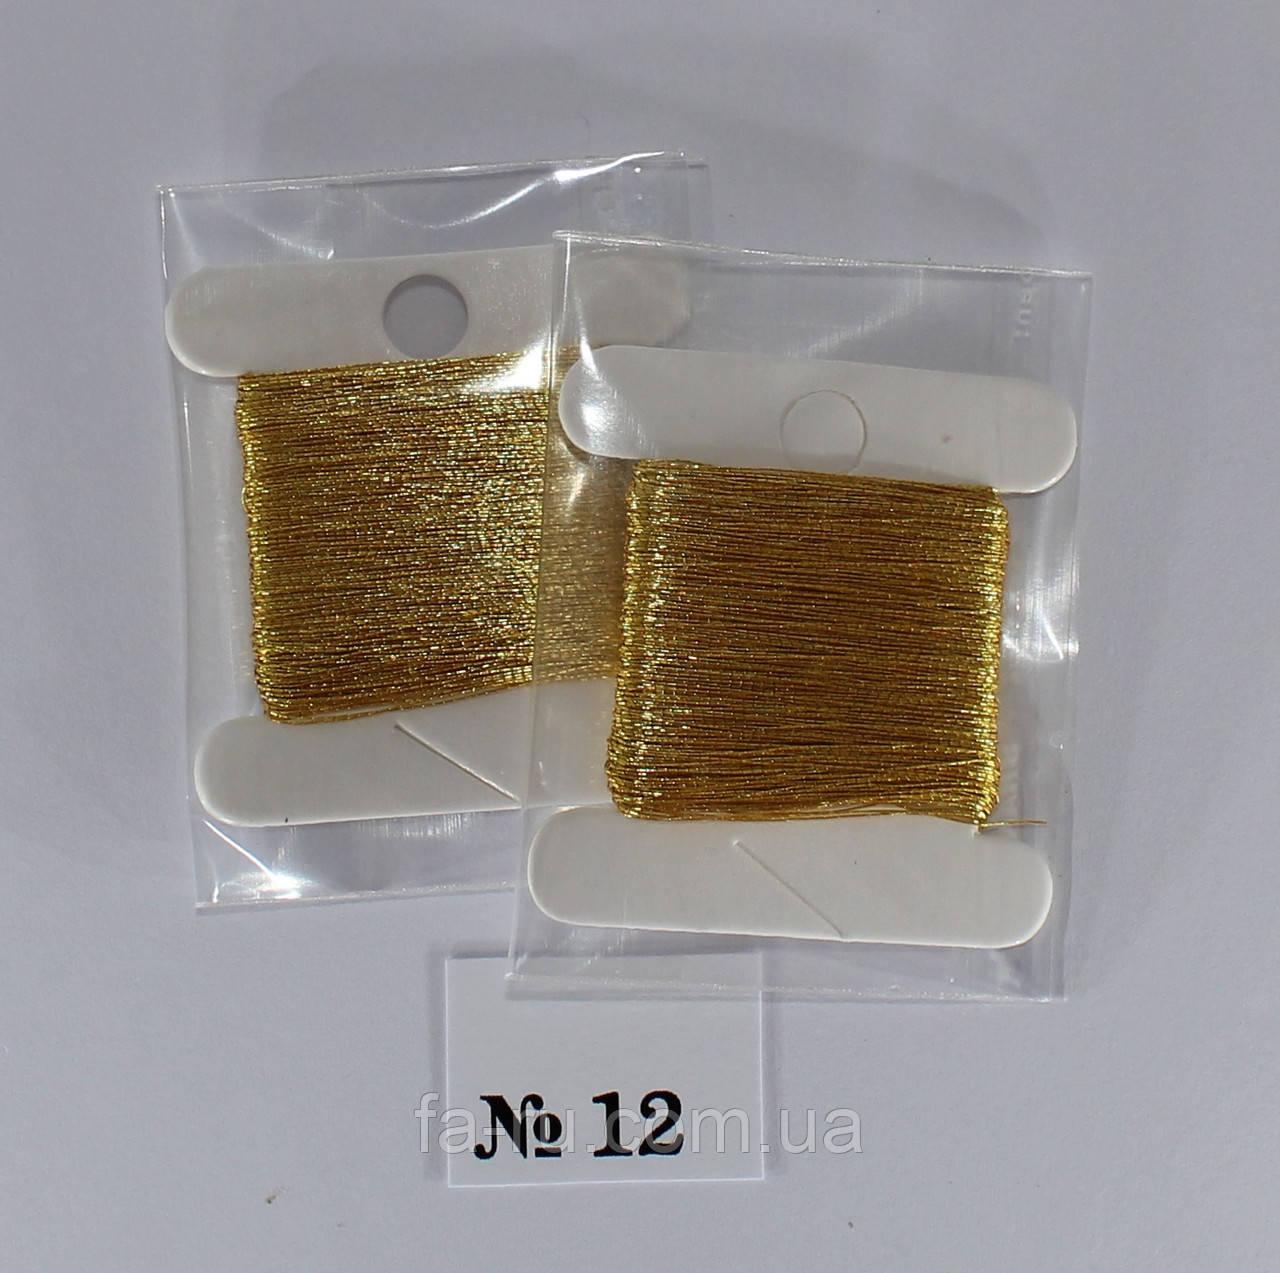 Люрекс Аллюр № 12. Золото яркое 30 м